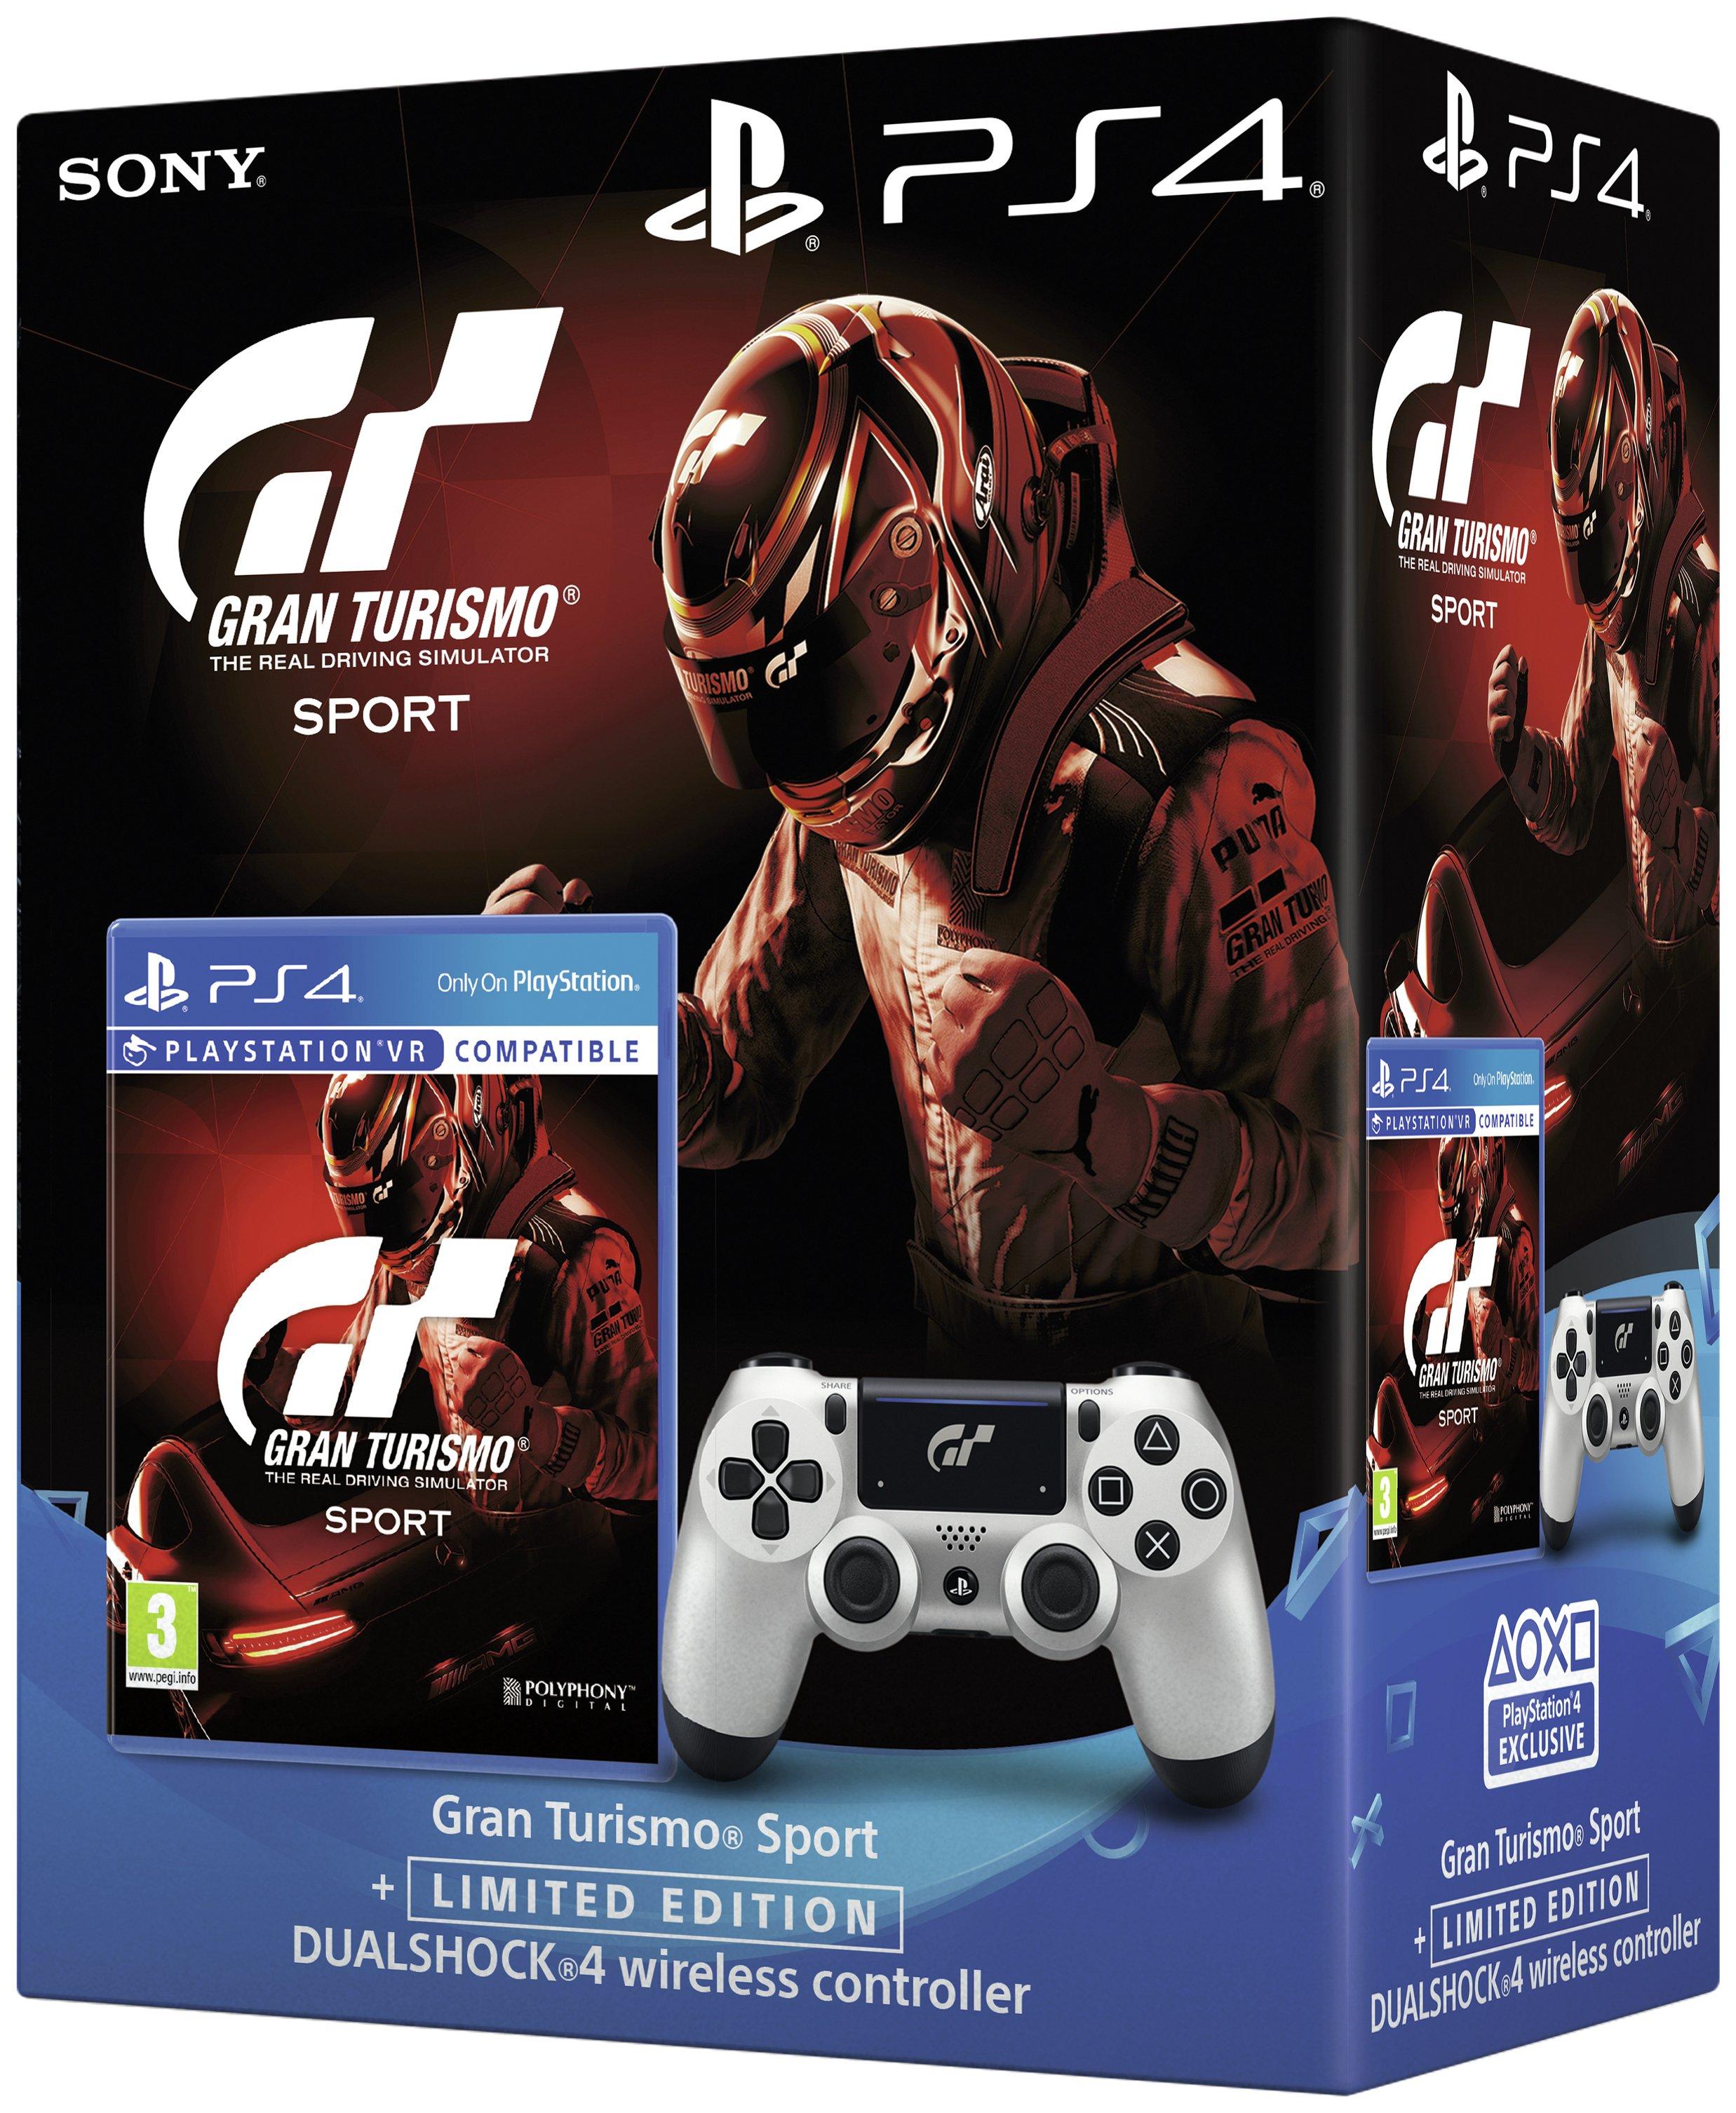 Gran Turismo Sport Limited Edn Dualshock 4 PS4 Game Bundle